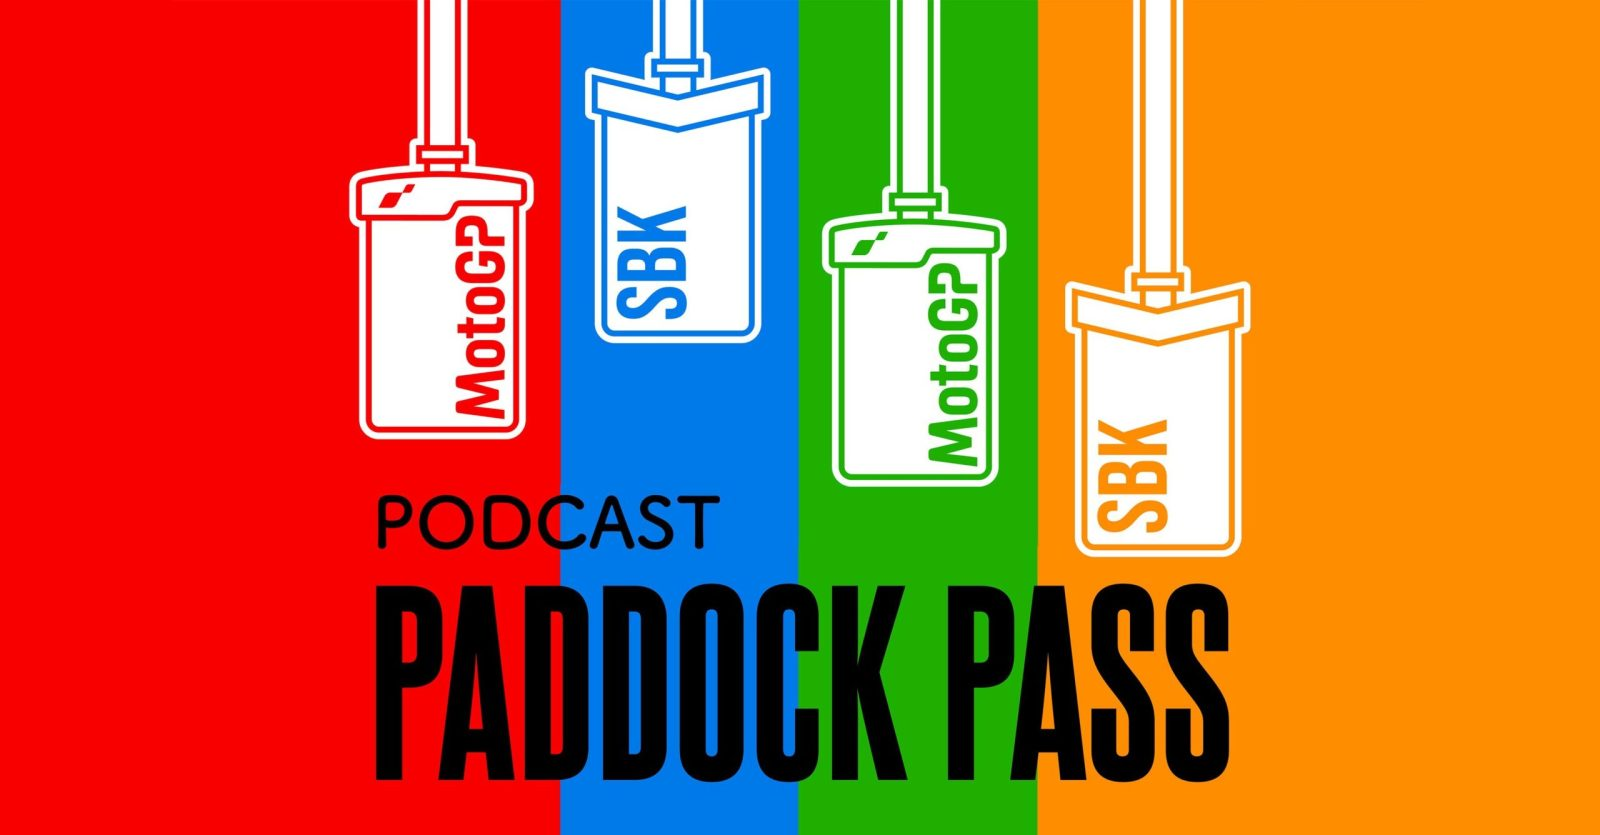 Paddock Pass Podcast Episode 244 – WorldSBK at Portimão